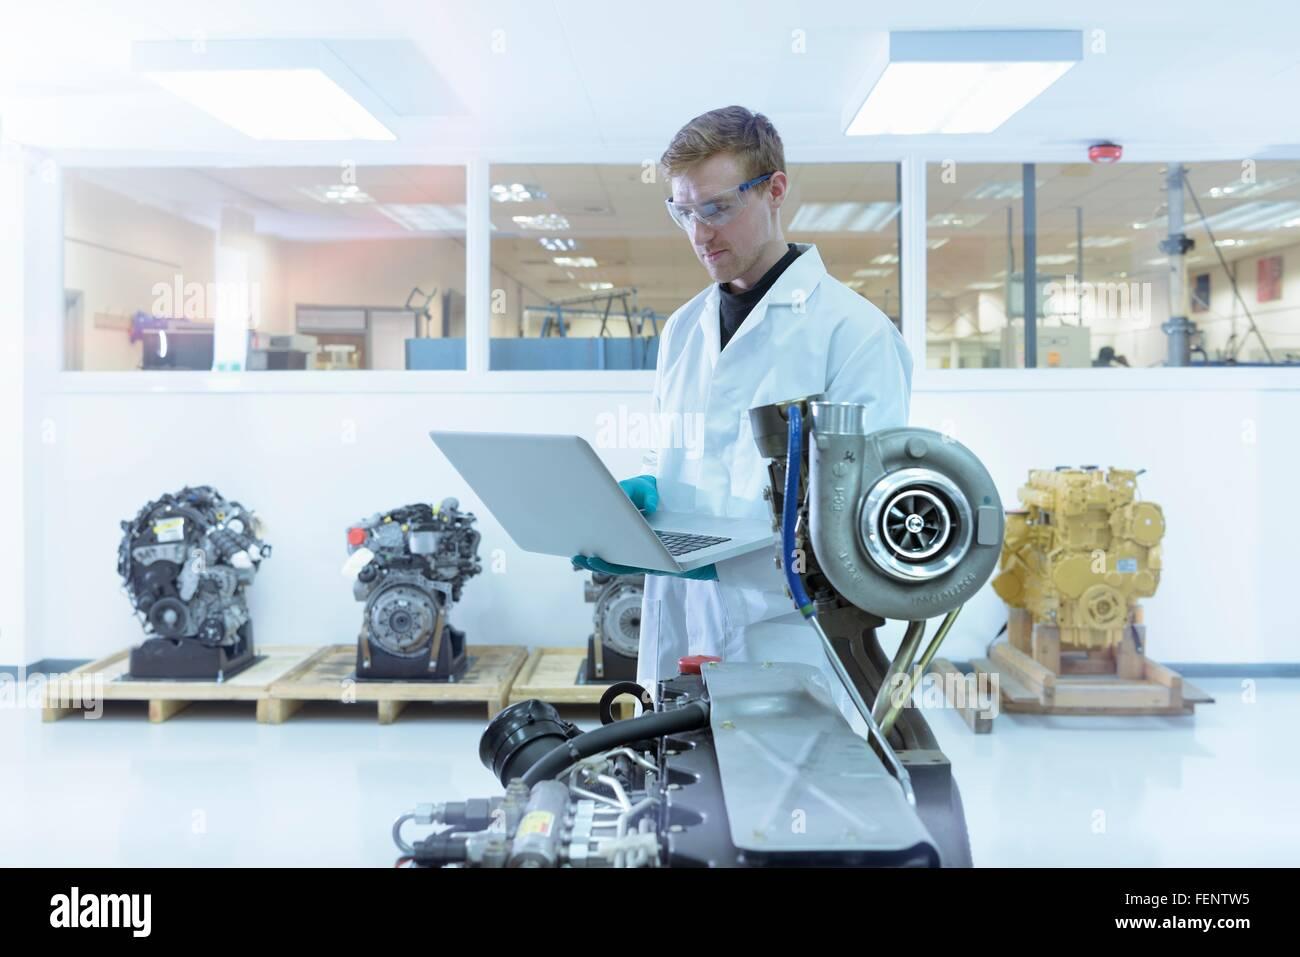 Wissenschaftler mit Laptop im Turbo-Ladegerät automotive Research laboratory Stockbild